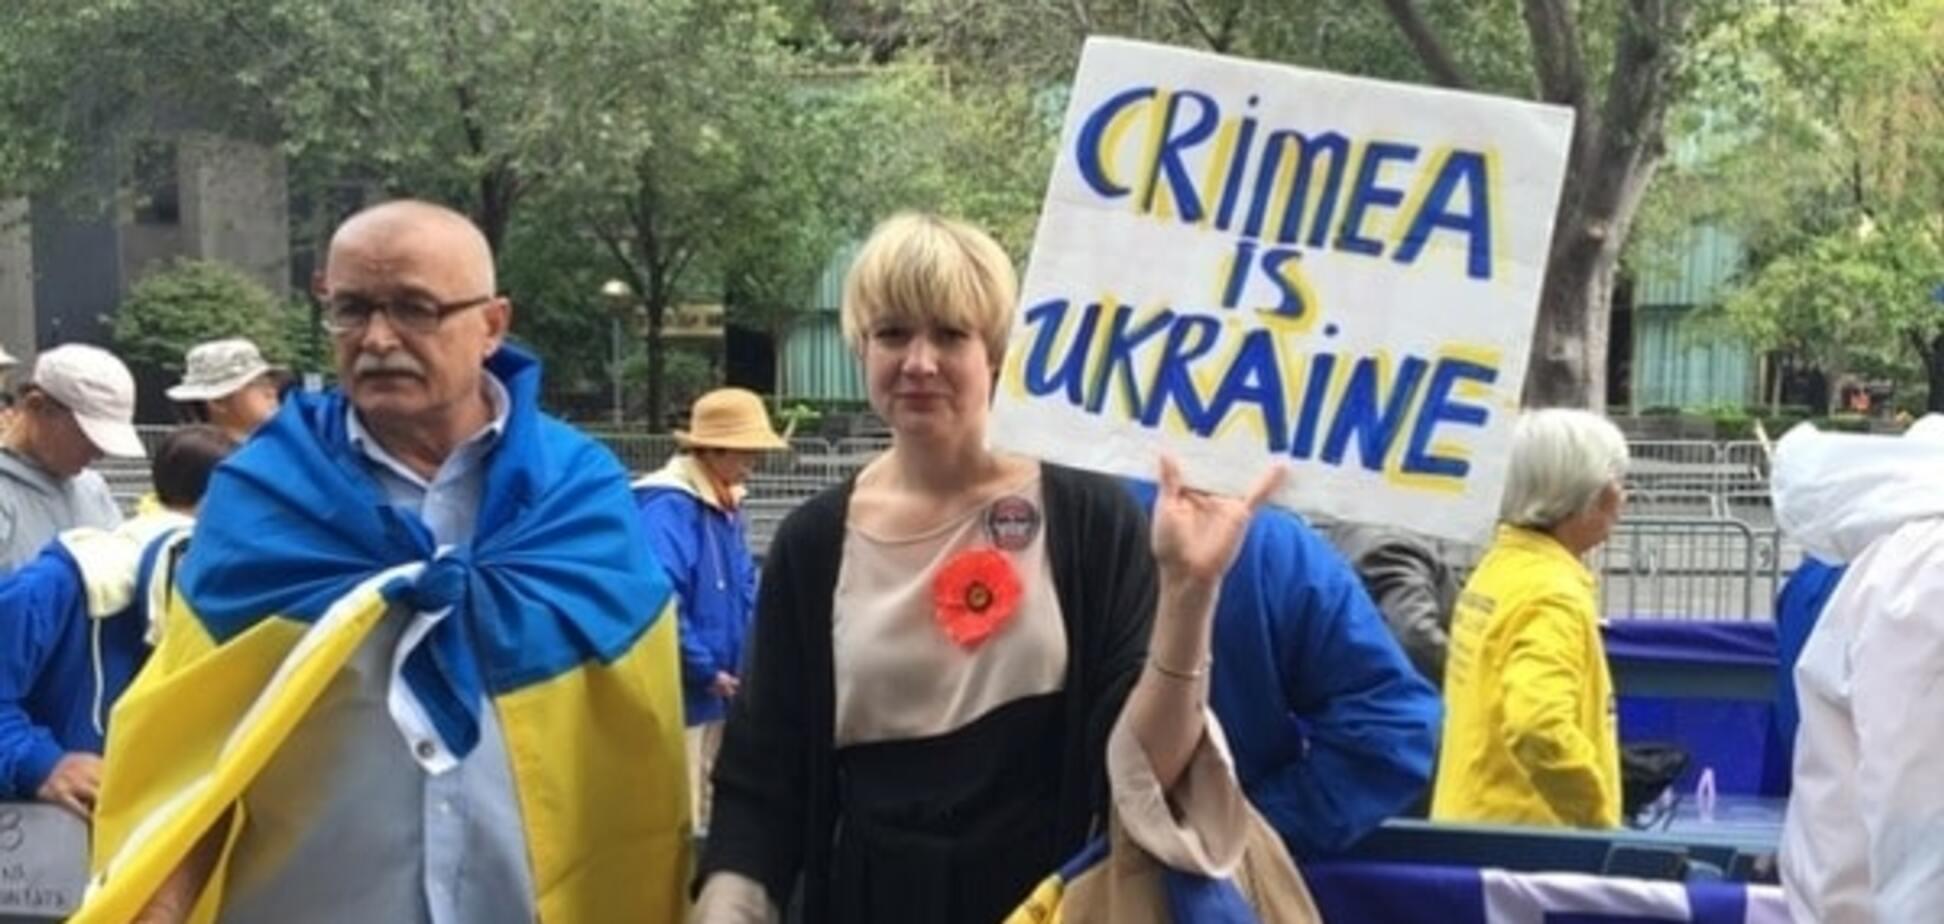 митинг против аннексии Крыма